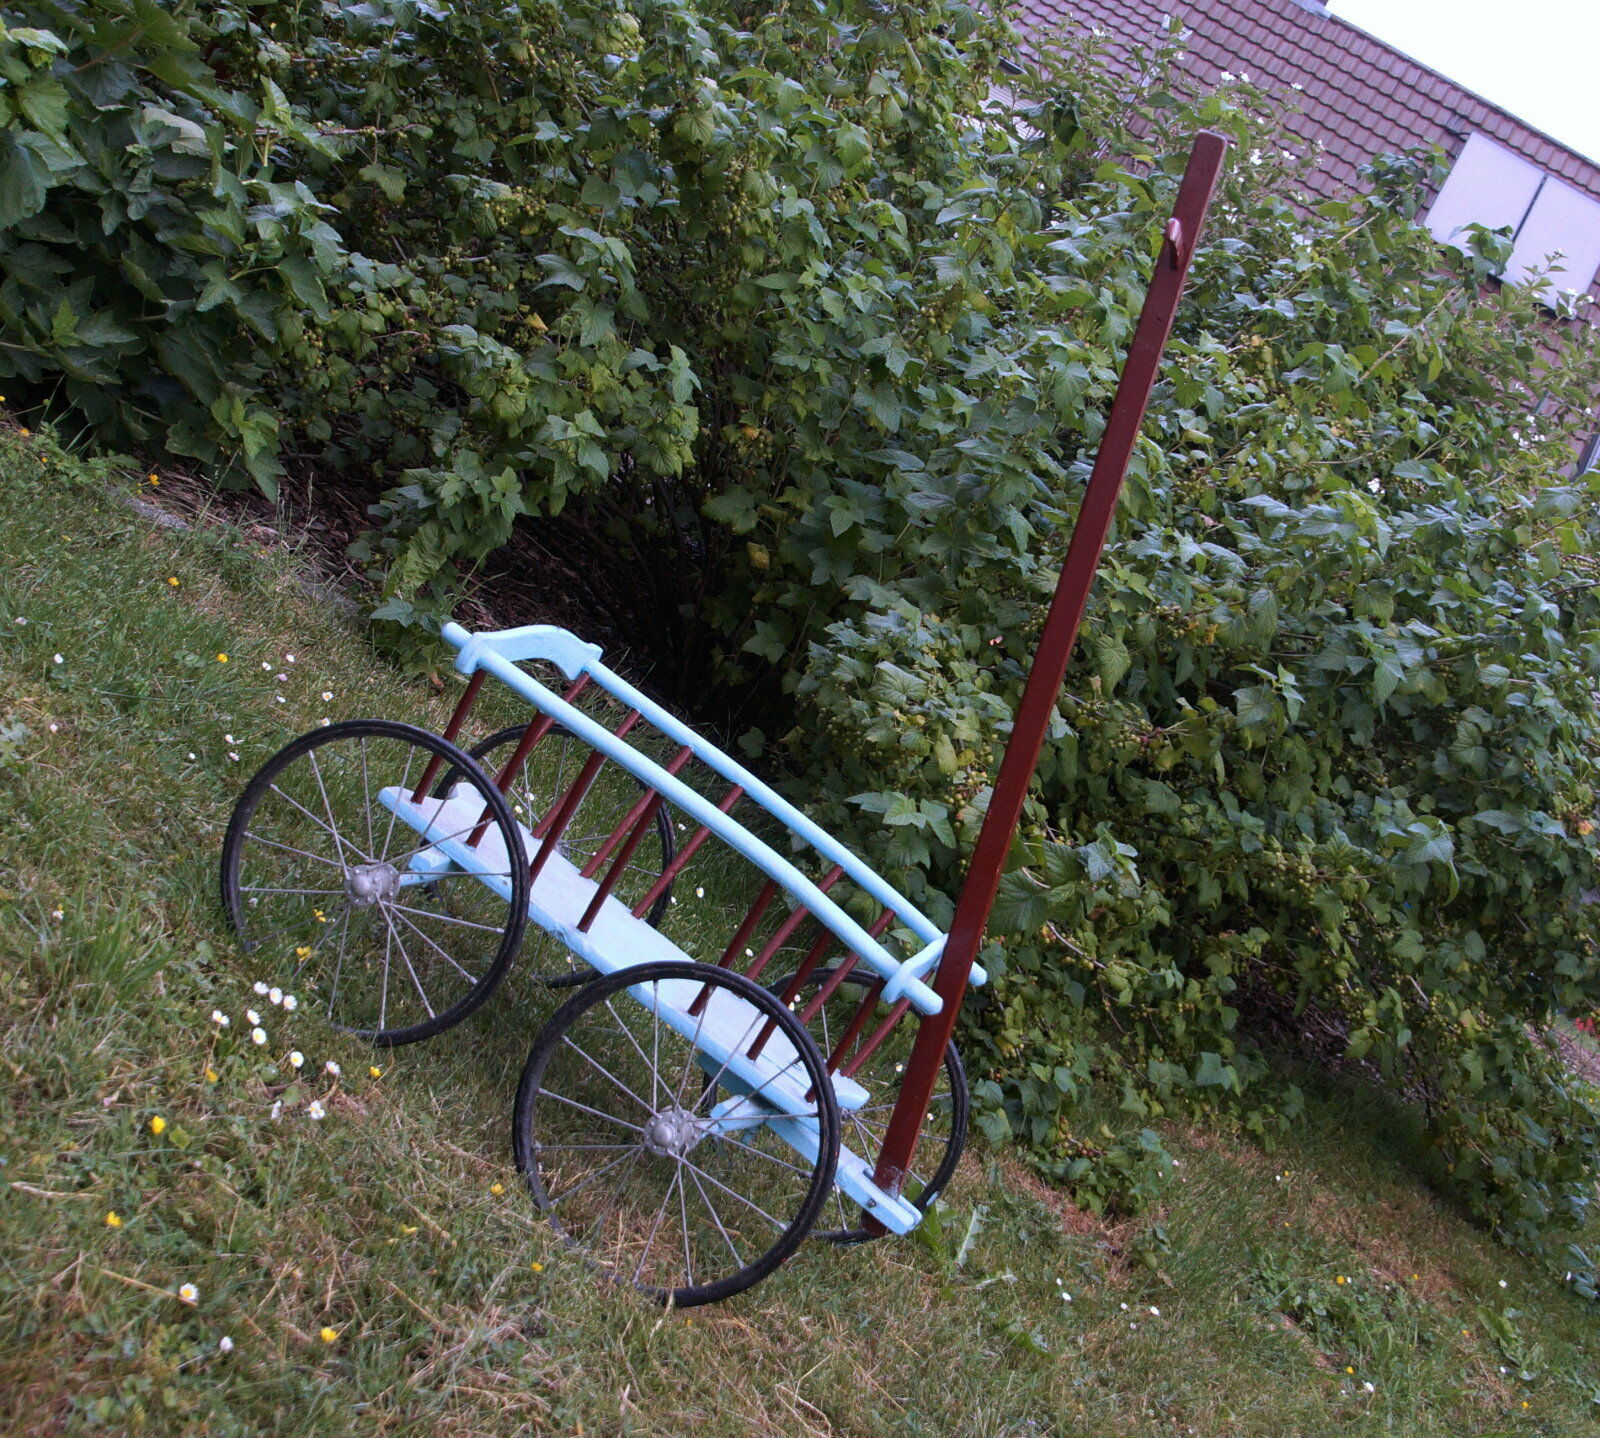 ge Chariot à tirer chef Voiture Enfants Chariot pour Chariot en bois Gründerzeit pour Chariot 1900 RAR 54cff4